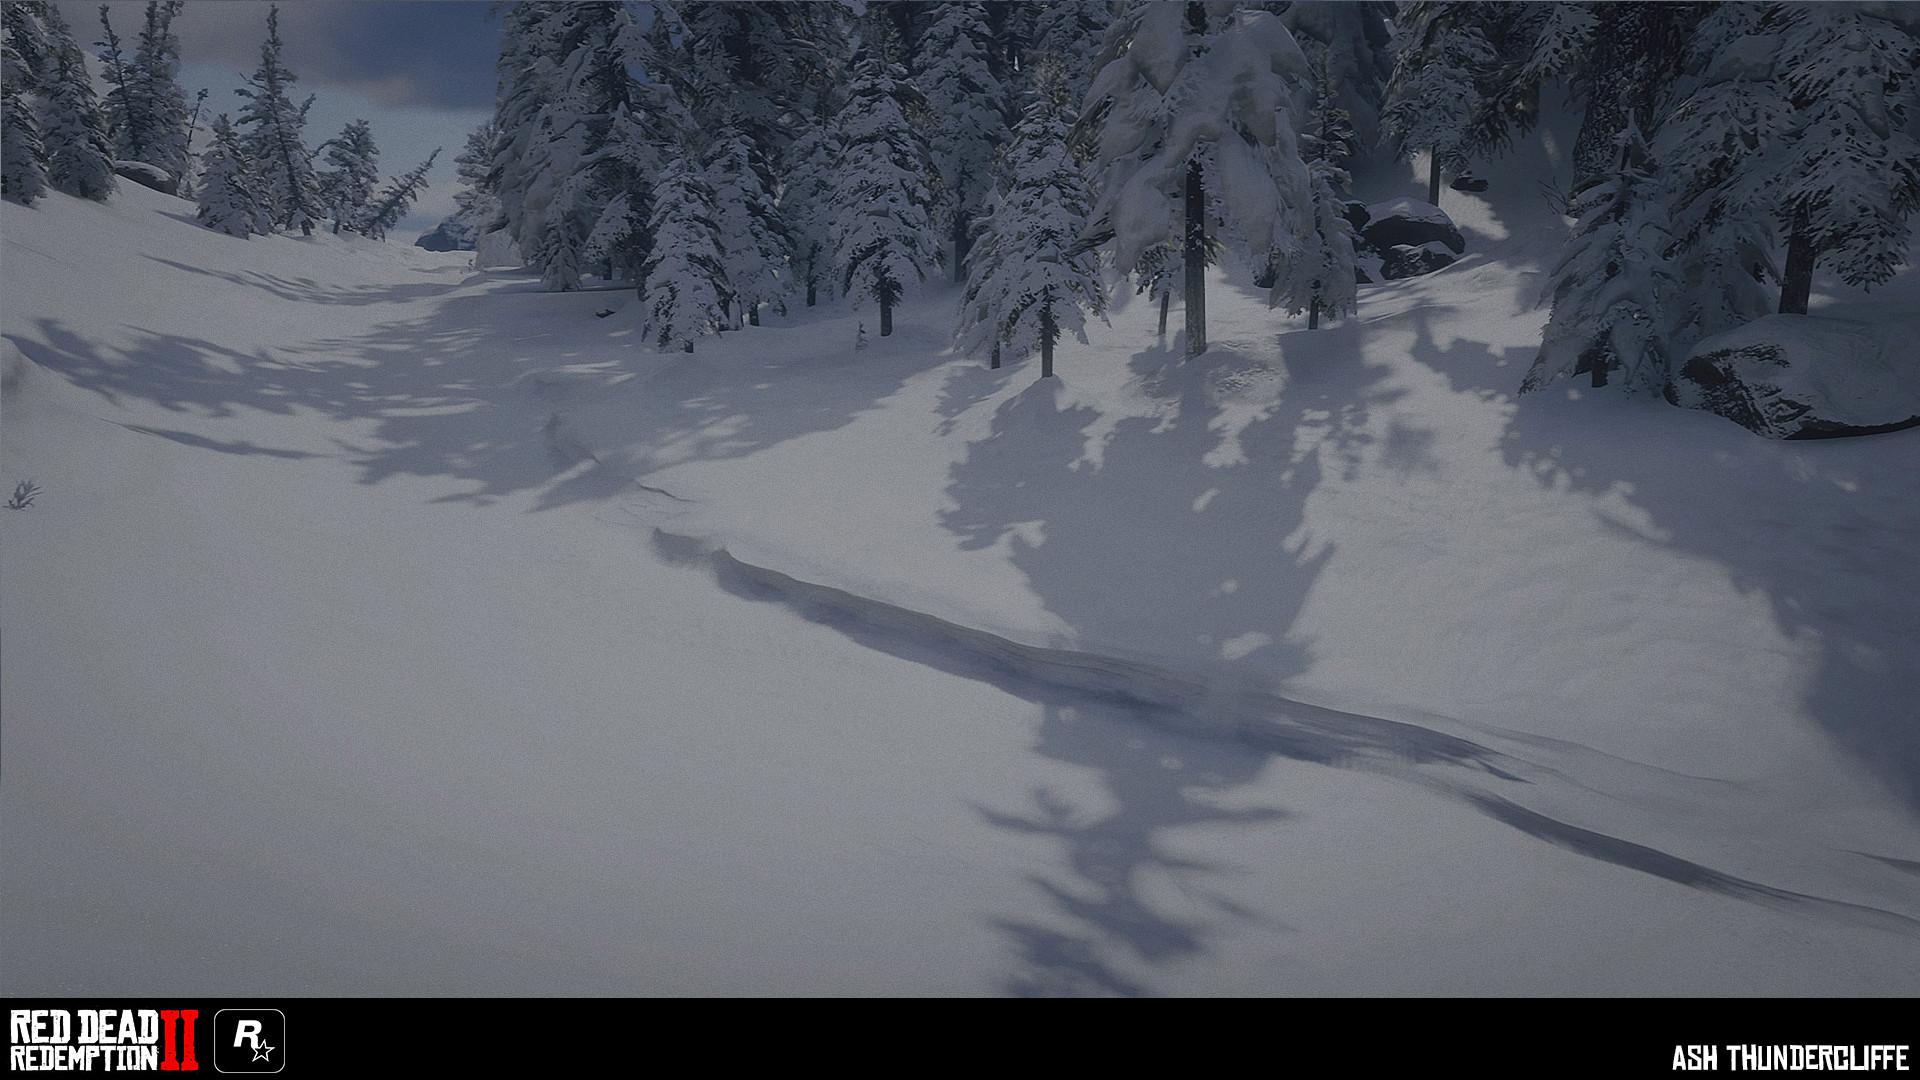 Ash thundercliffe snow 3